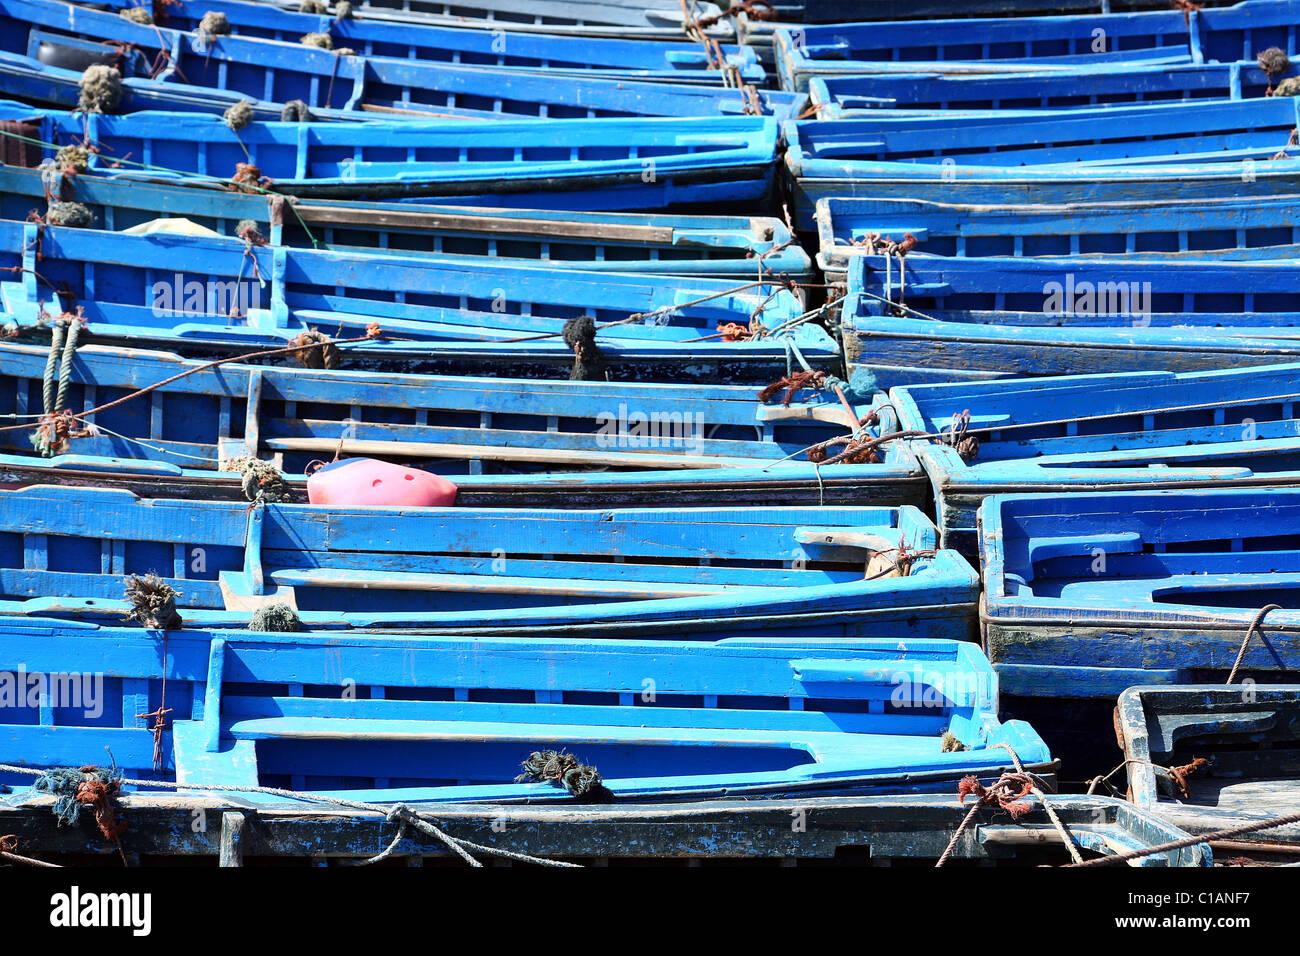 Fishing boat, Essaouira, Morocco, North Africa - Stock Image